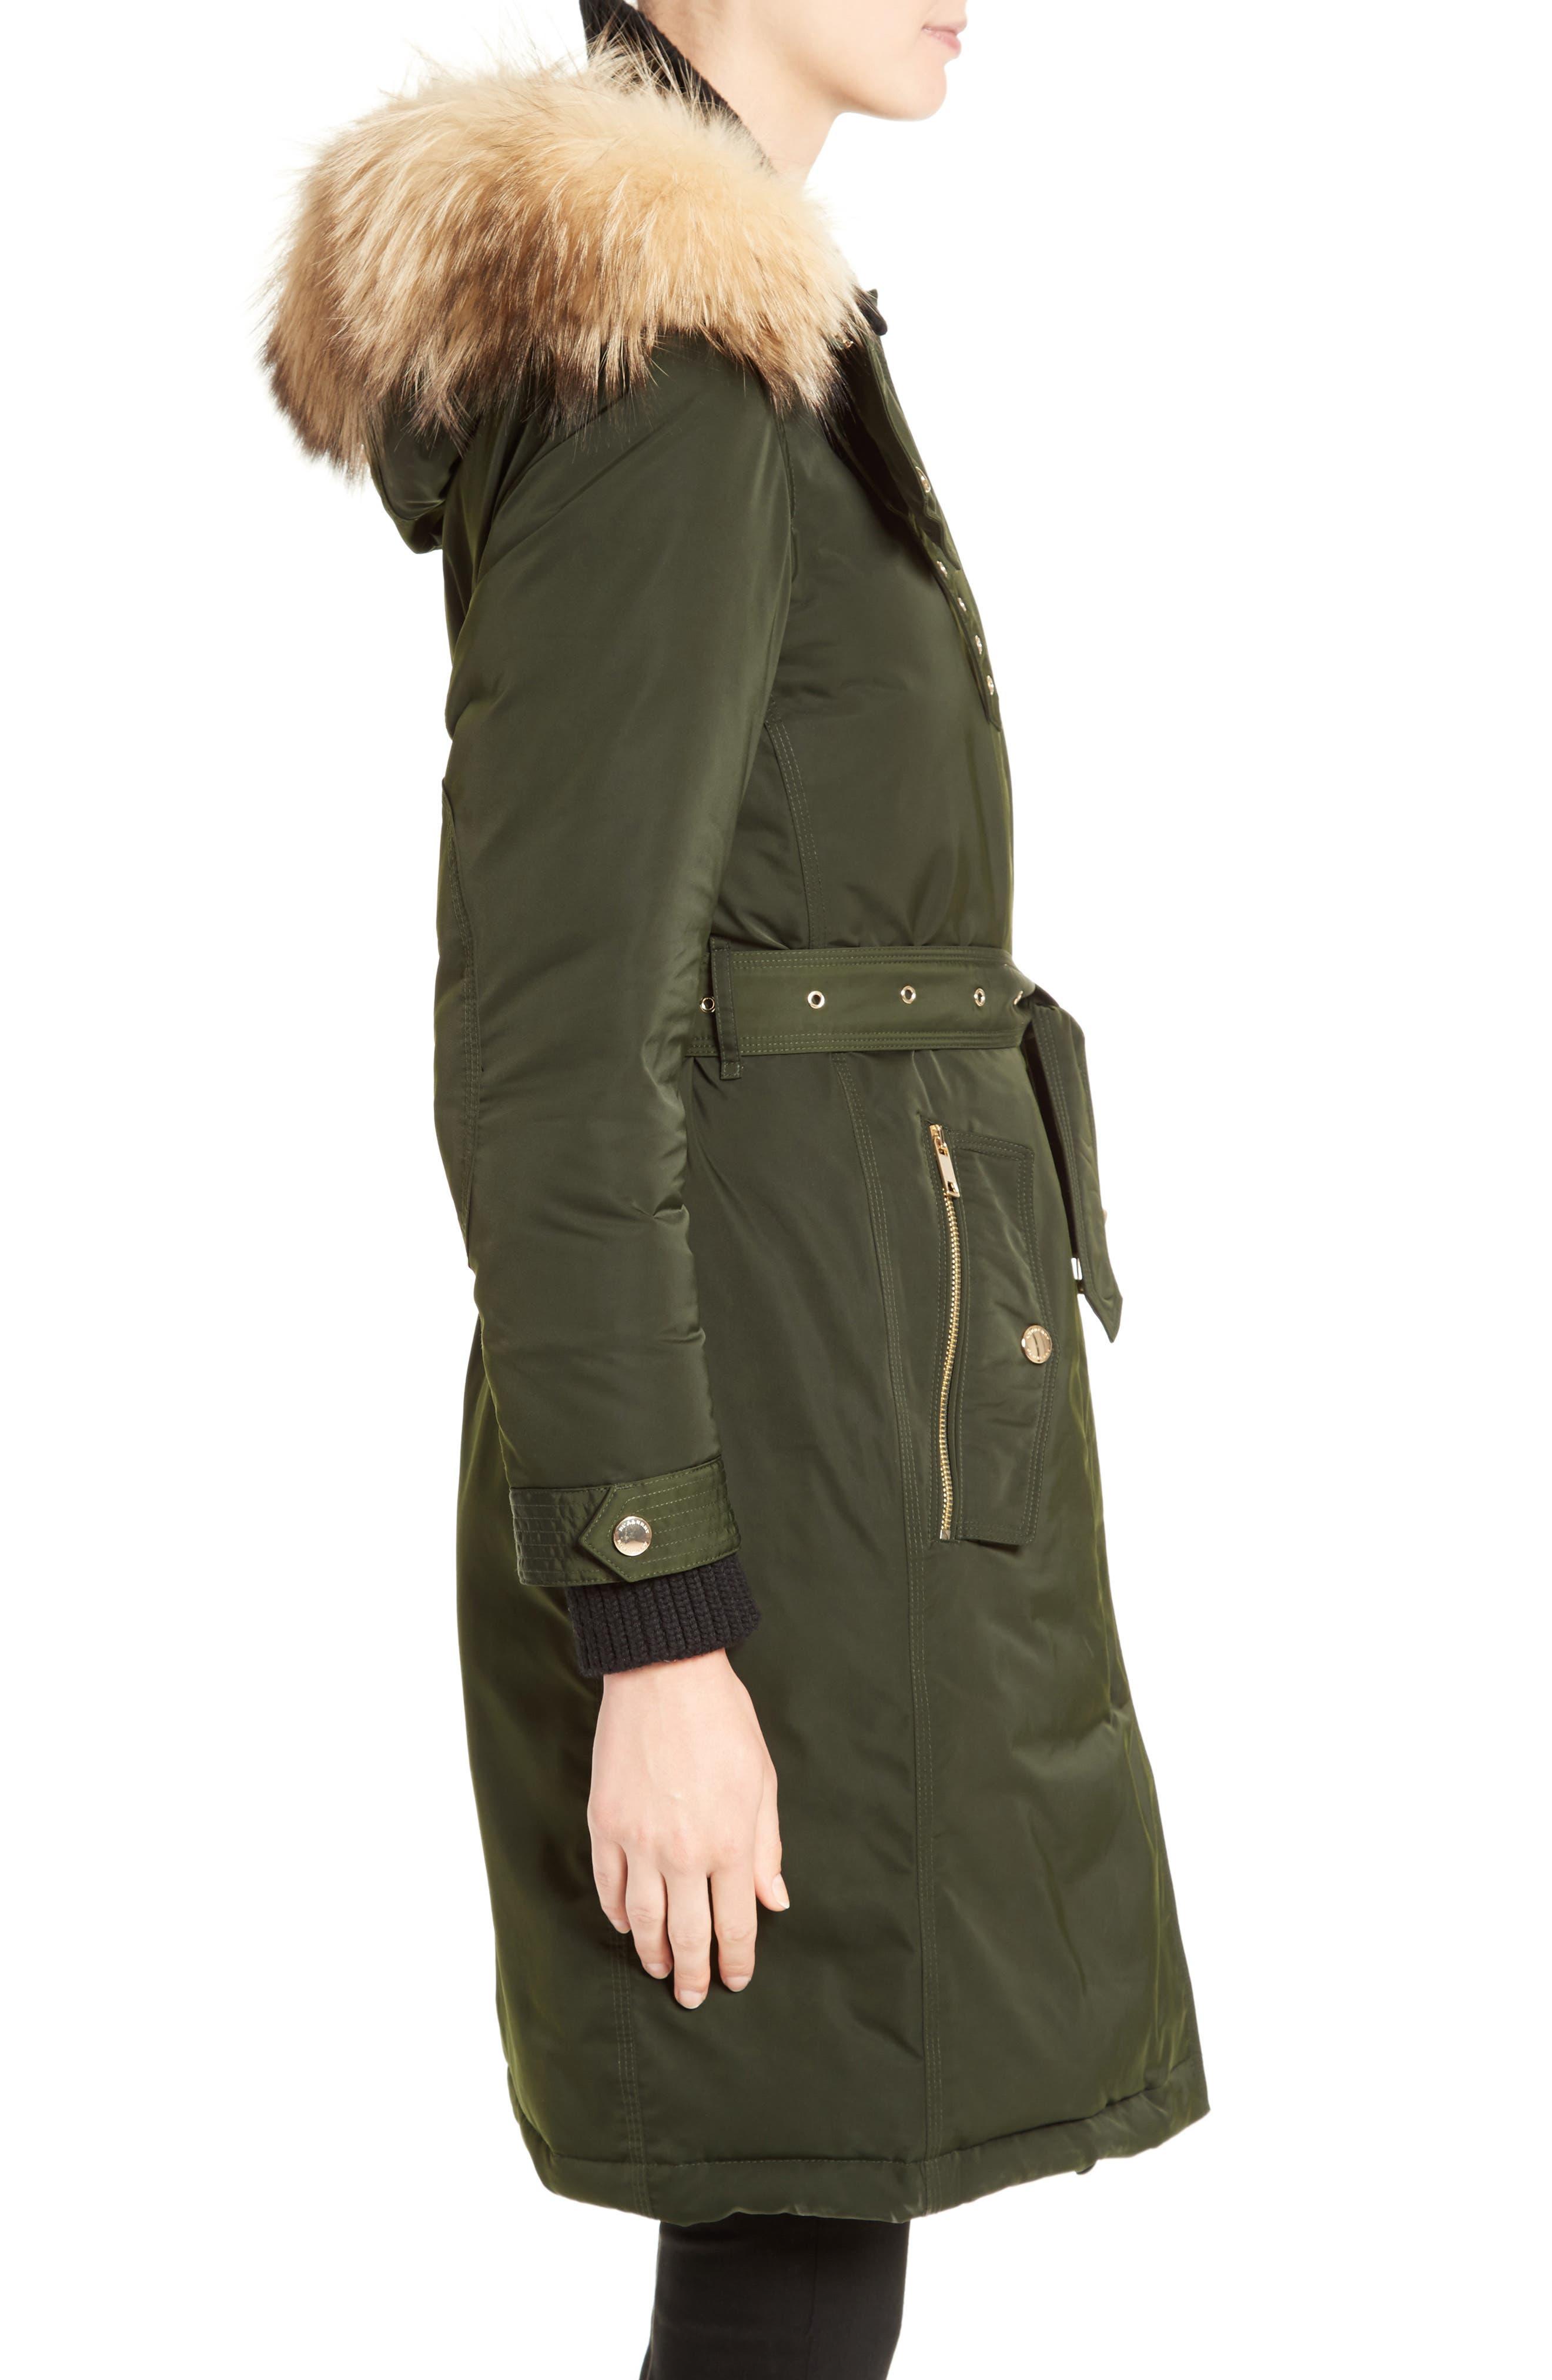 Hunnbridge Parka with Genuine Fox Fur Trim,                             Alternate thumbnail 4, color,                             Dark Cedar Green